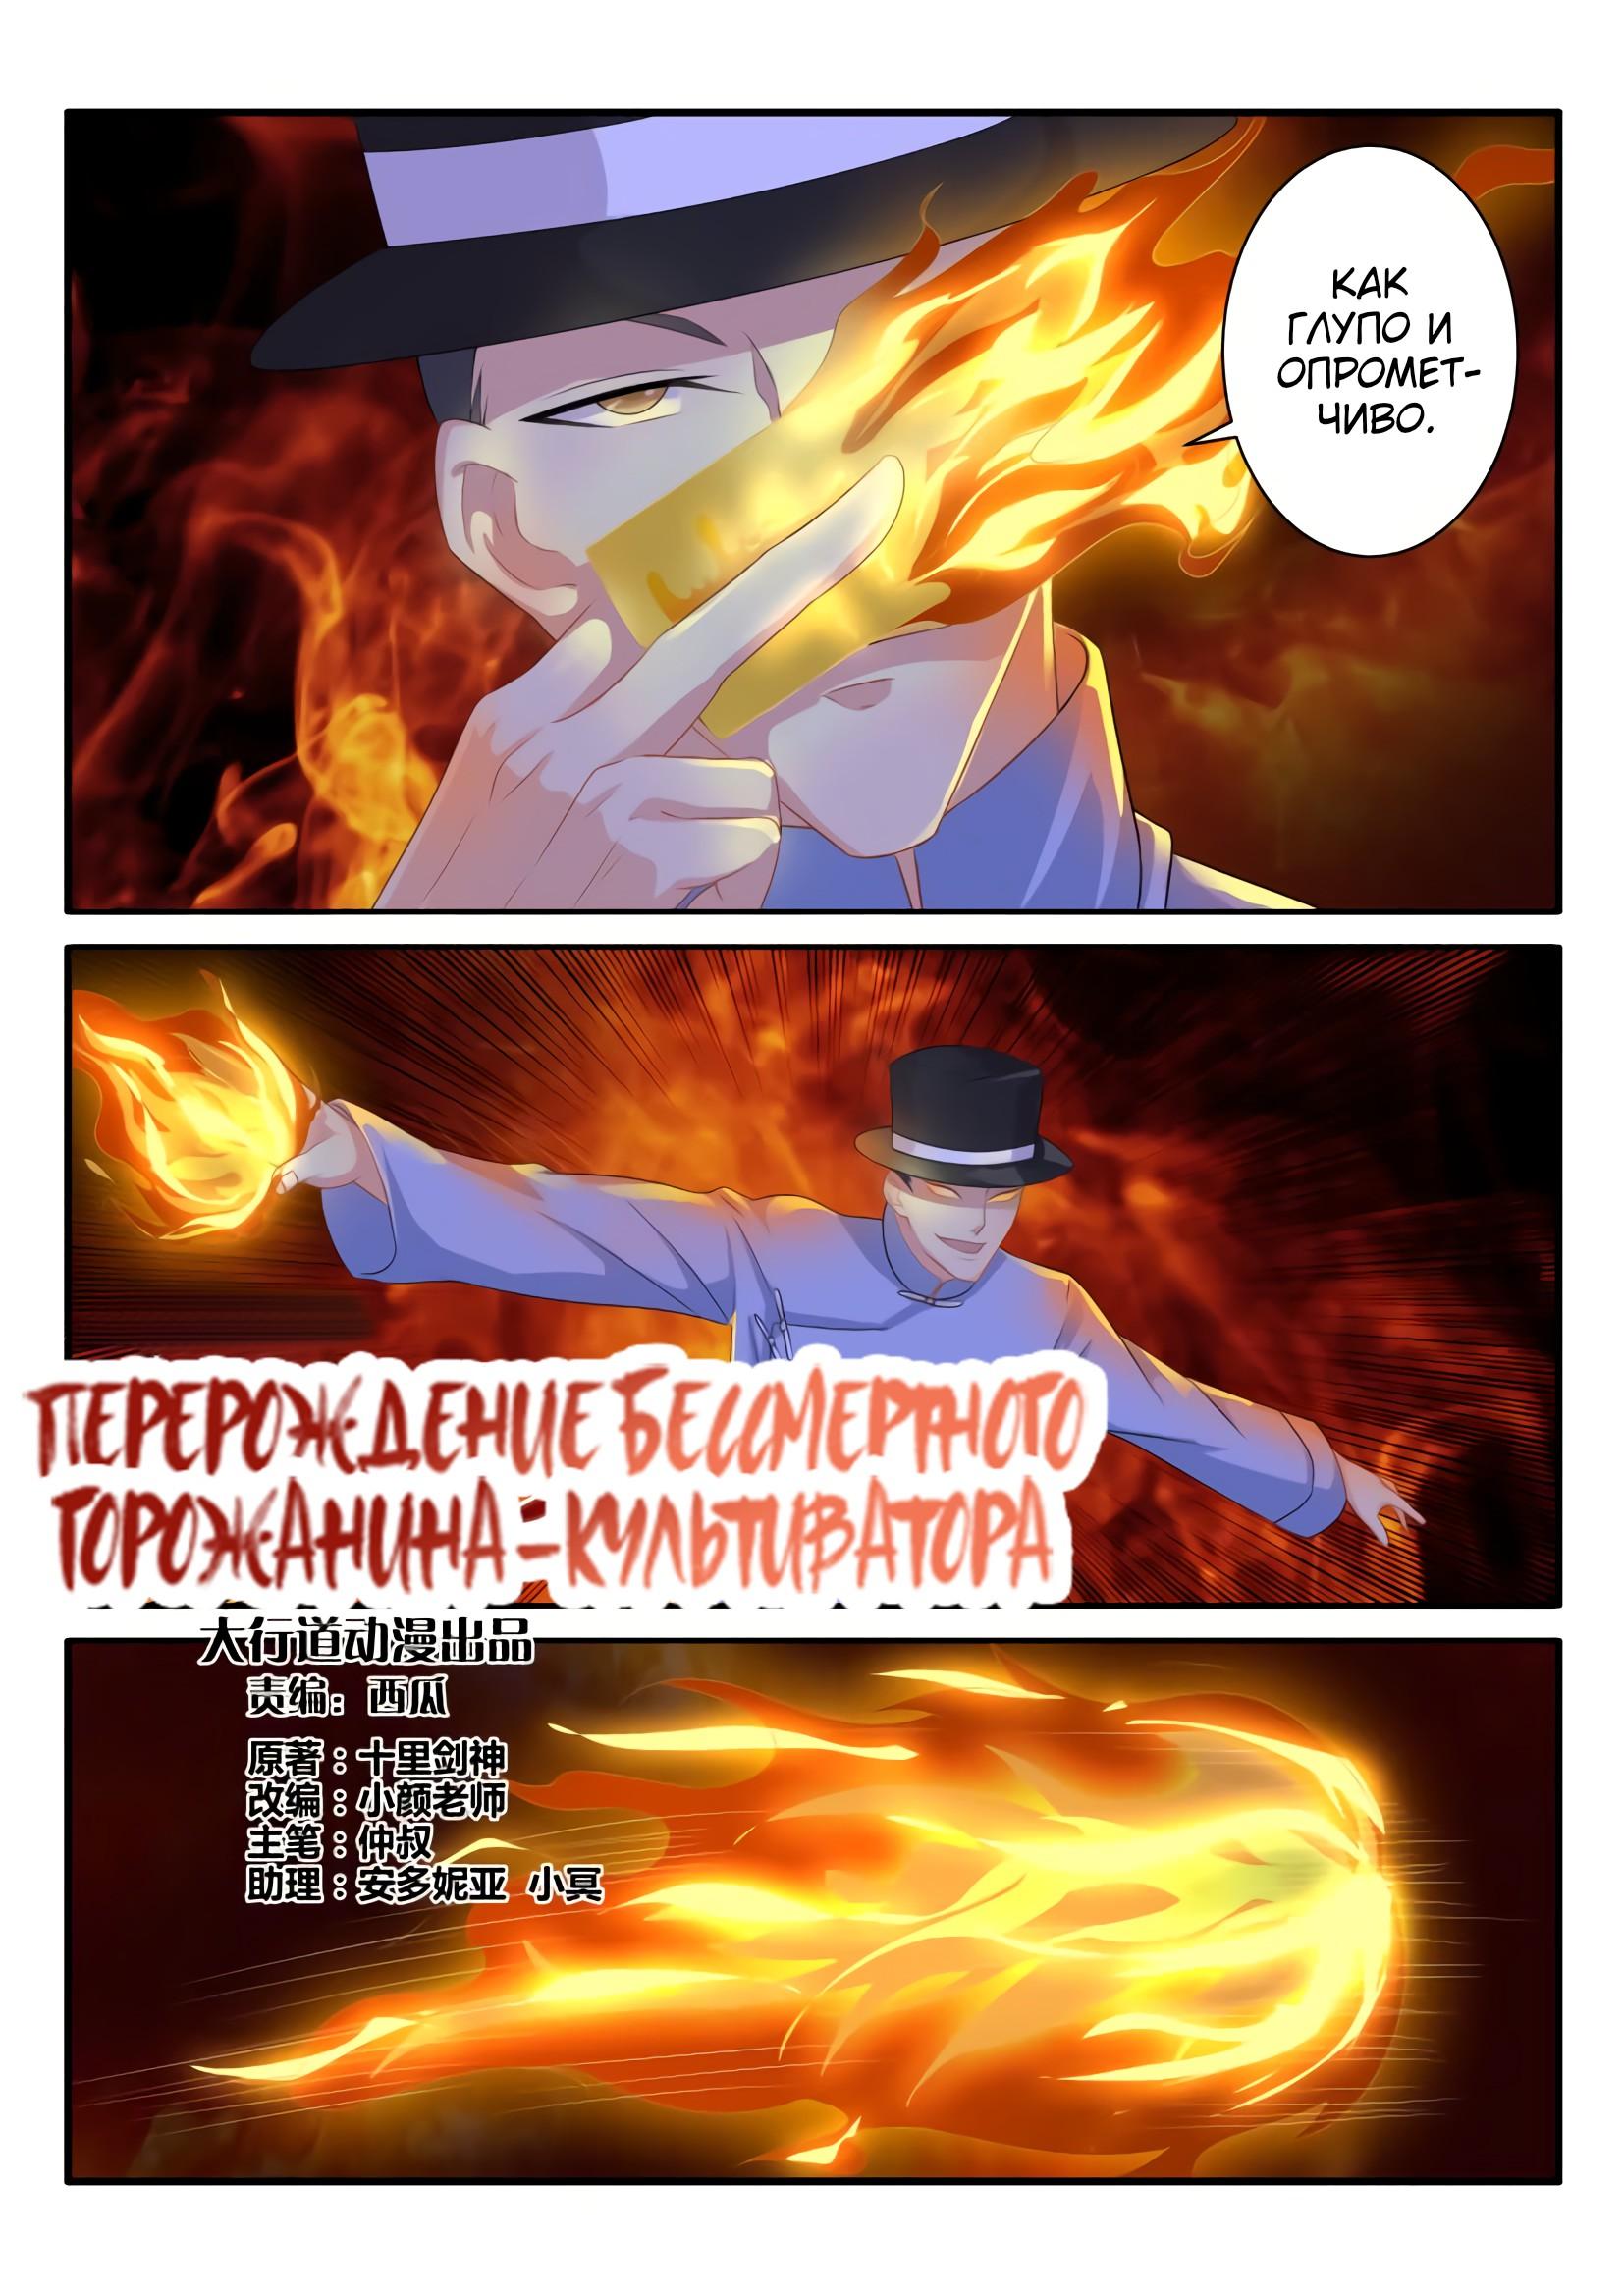 https://r2.ninemanga.com/comics/pic5/40/37032/1464904/1564142235810.jpg Page 8